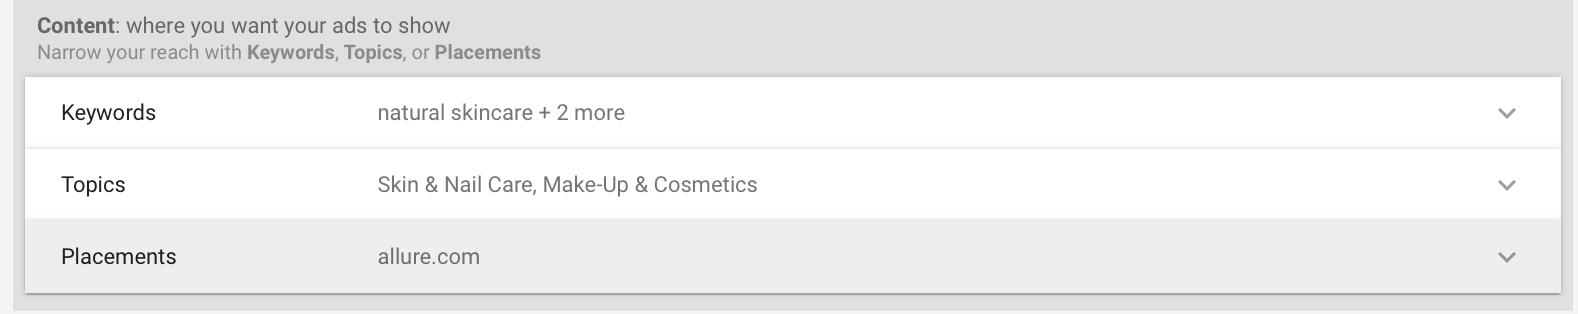 how to use contextual advertising Google AdSense